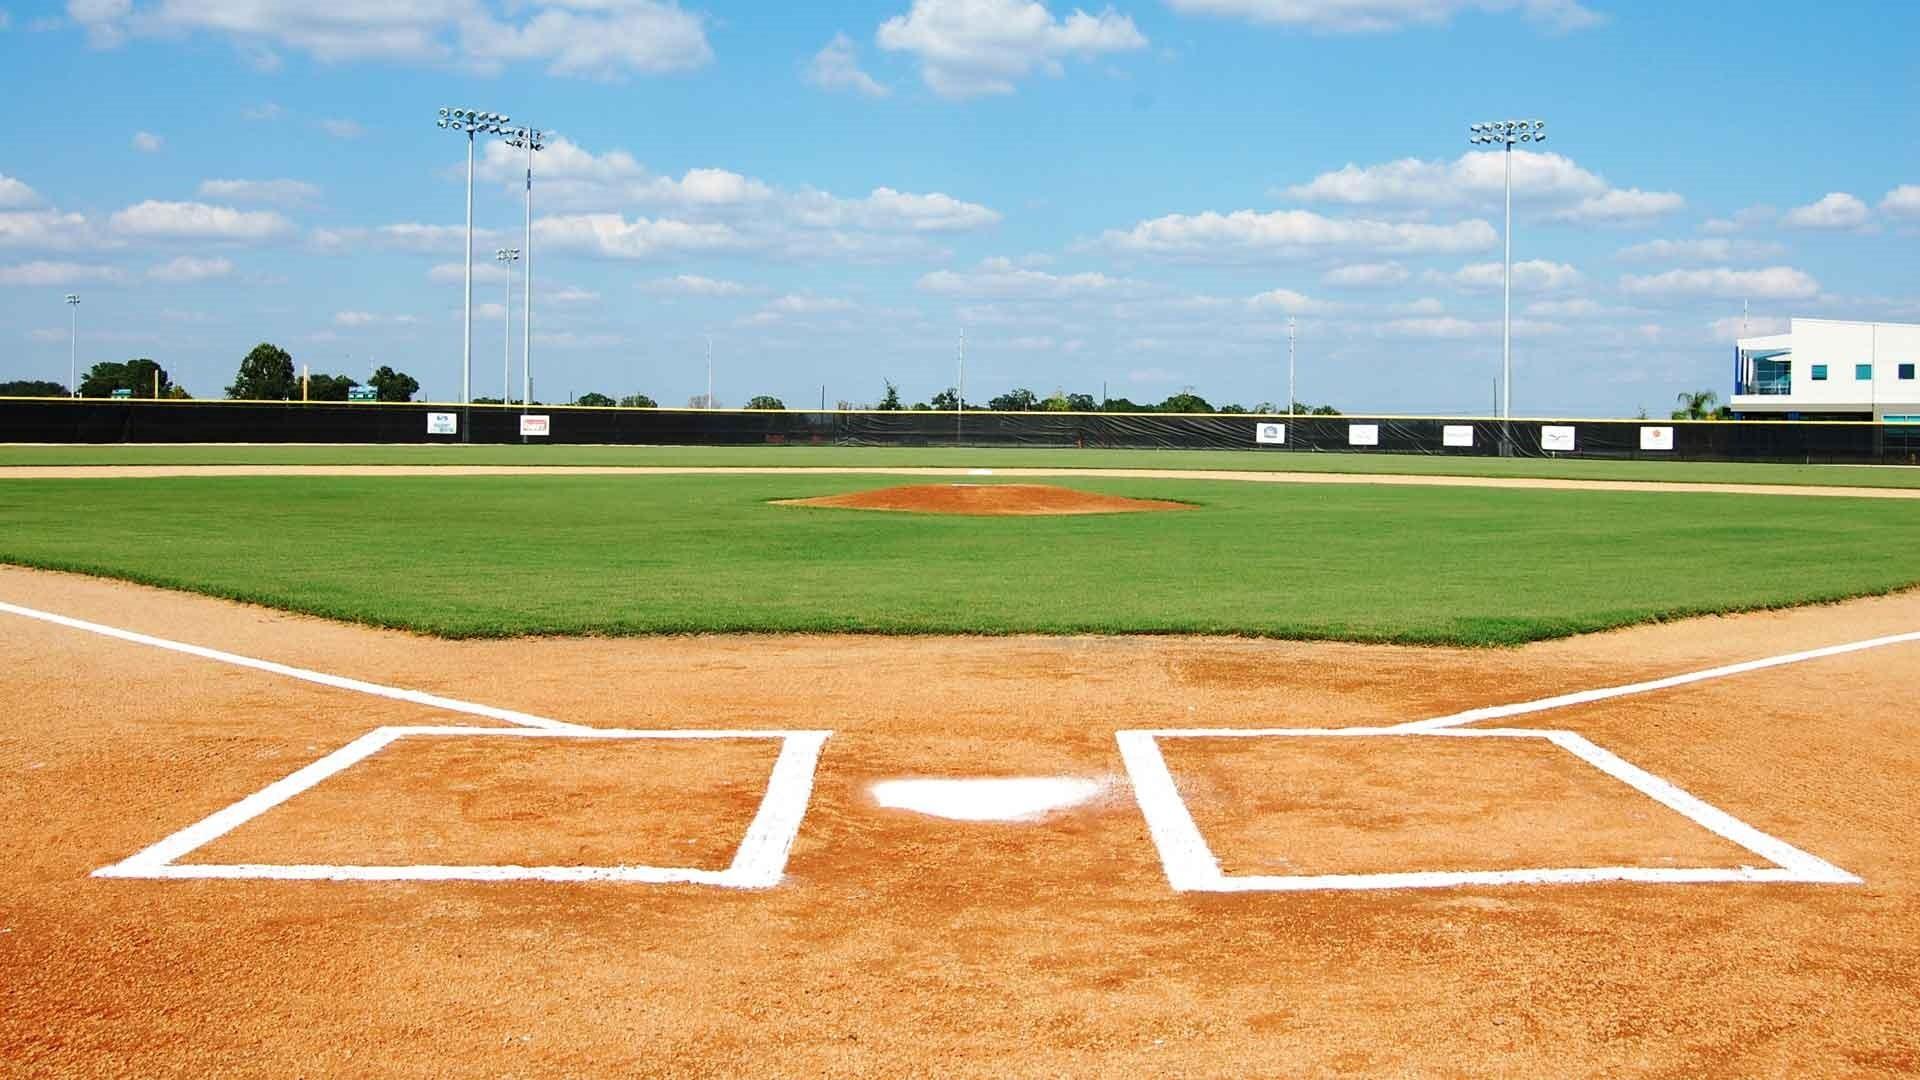 Softball hd wallpaper download